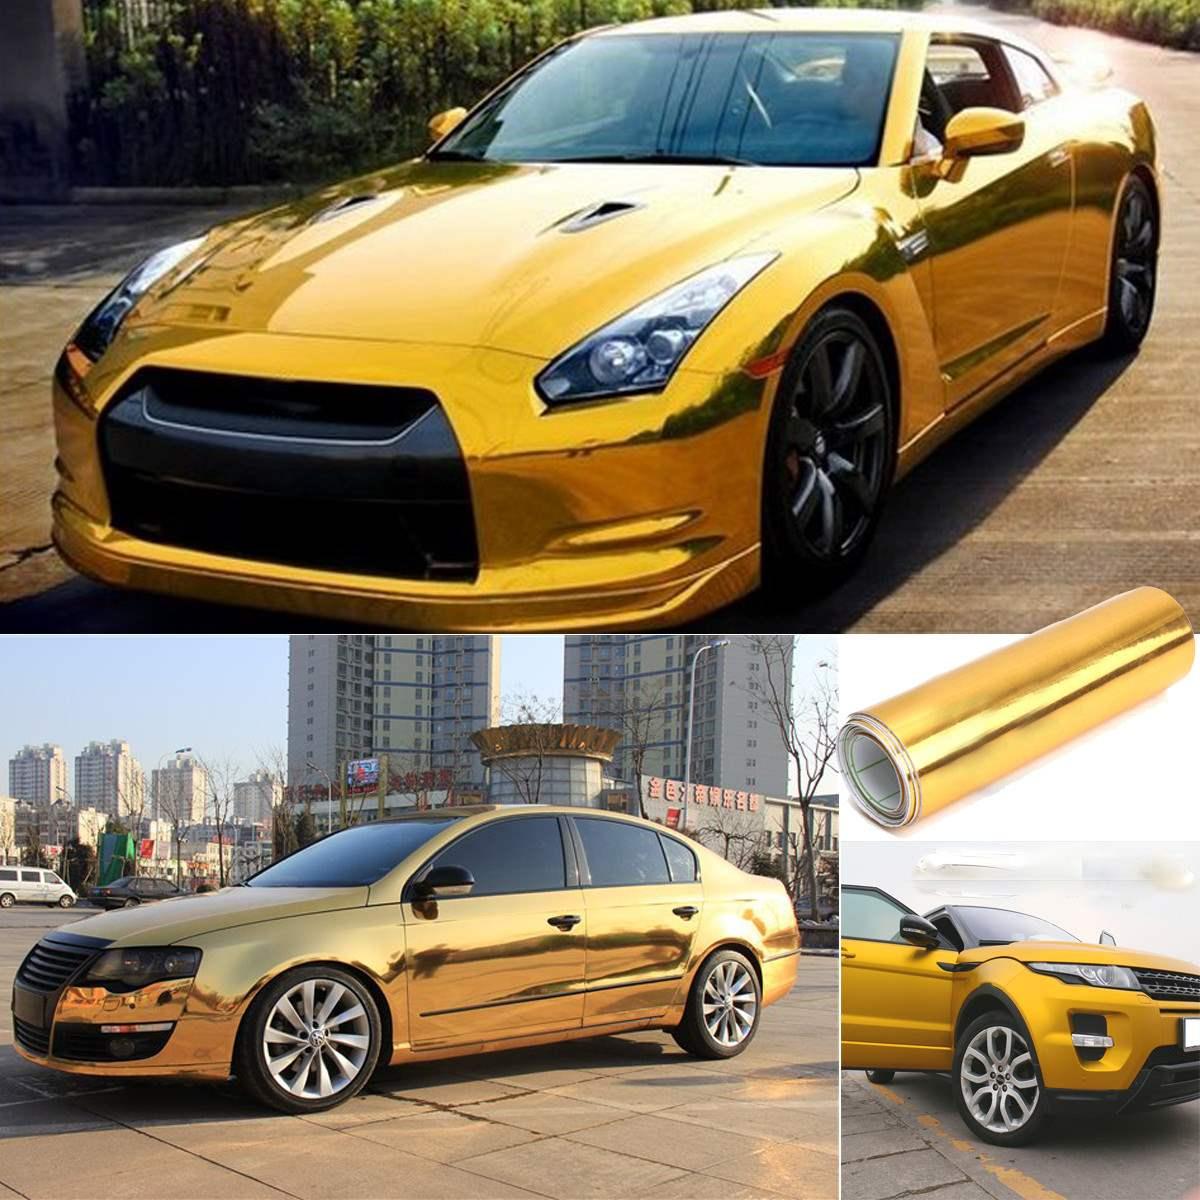 Car sticker design selangor - Gold Golden Chrome Mirror Vinyl Wrap Film Car Sticker Decal Bubble Free Air Release Diy Car